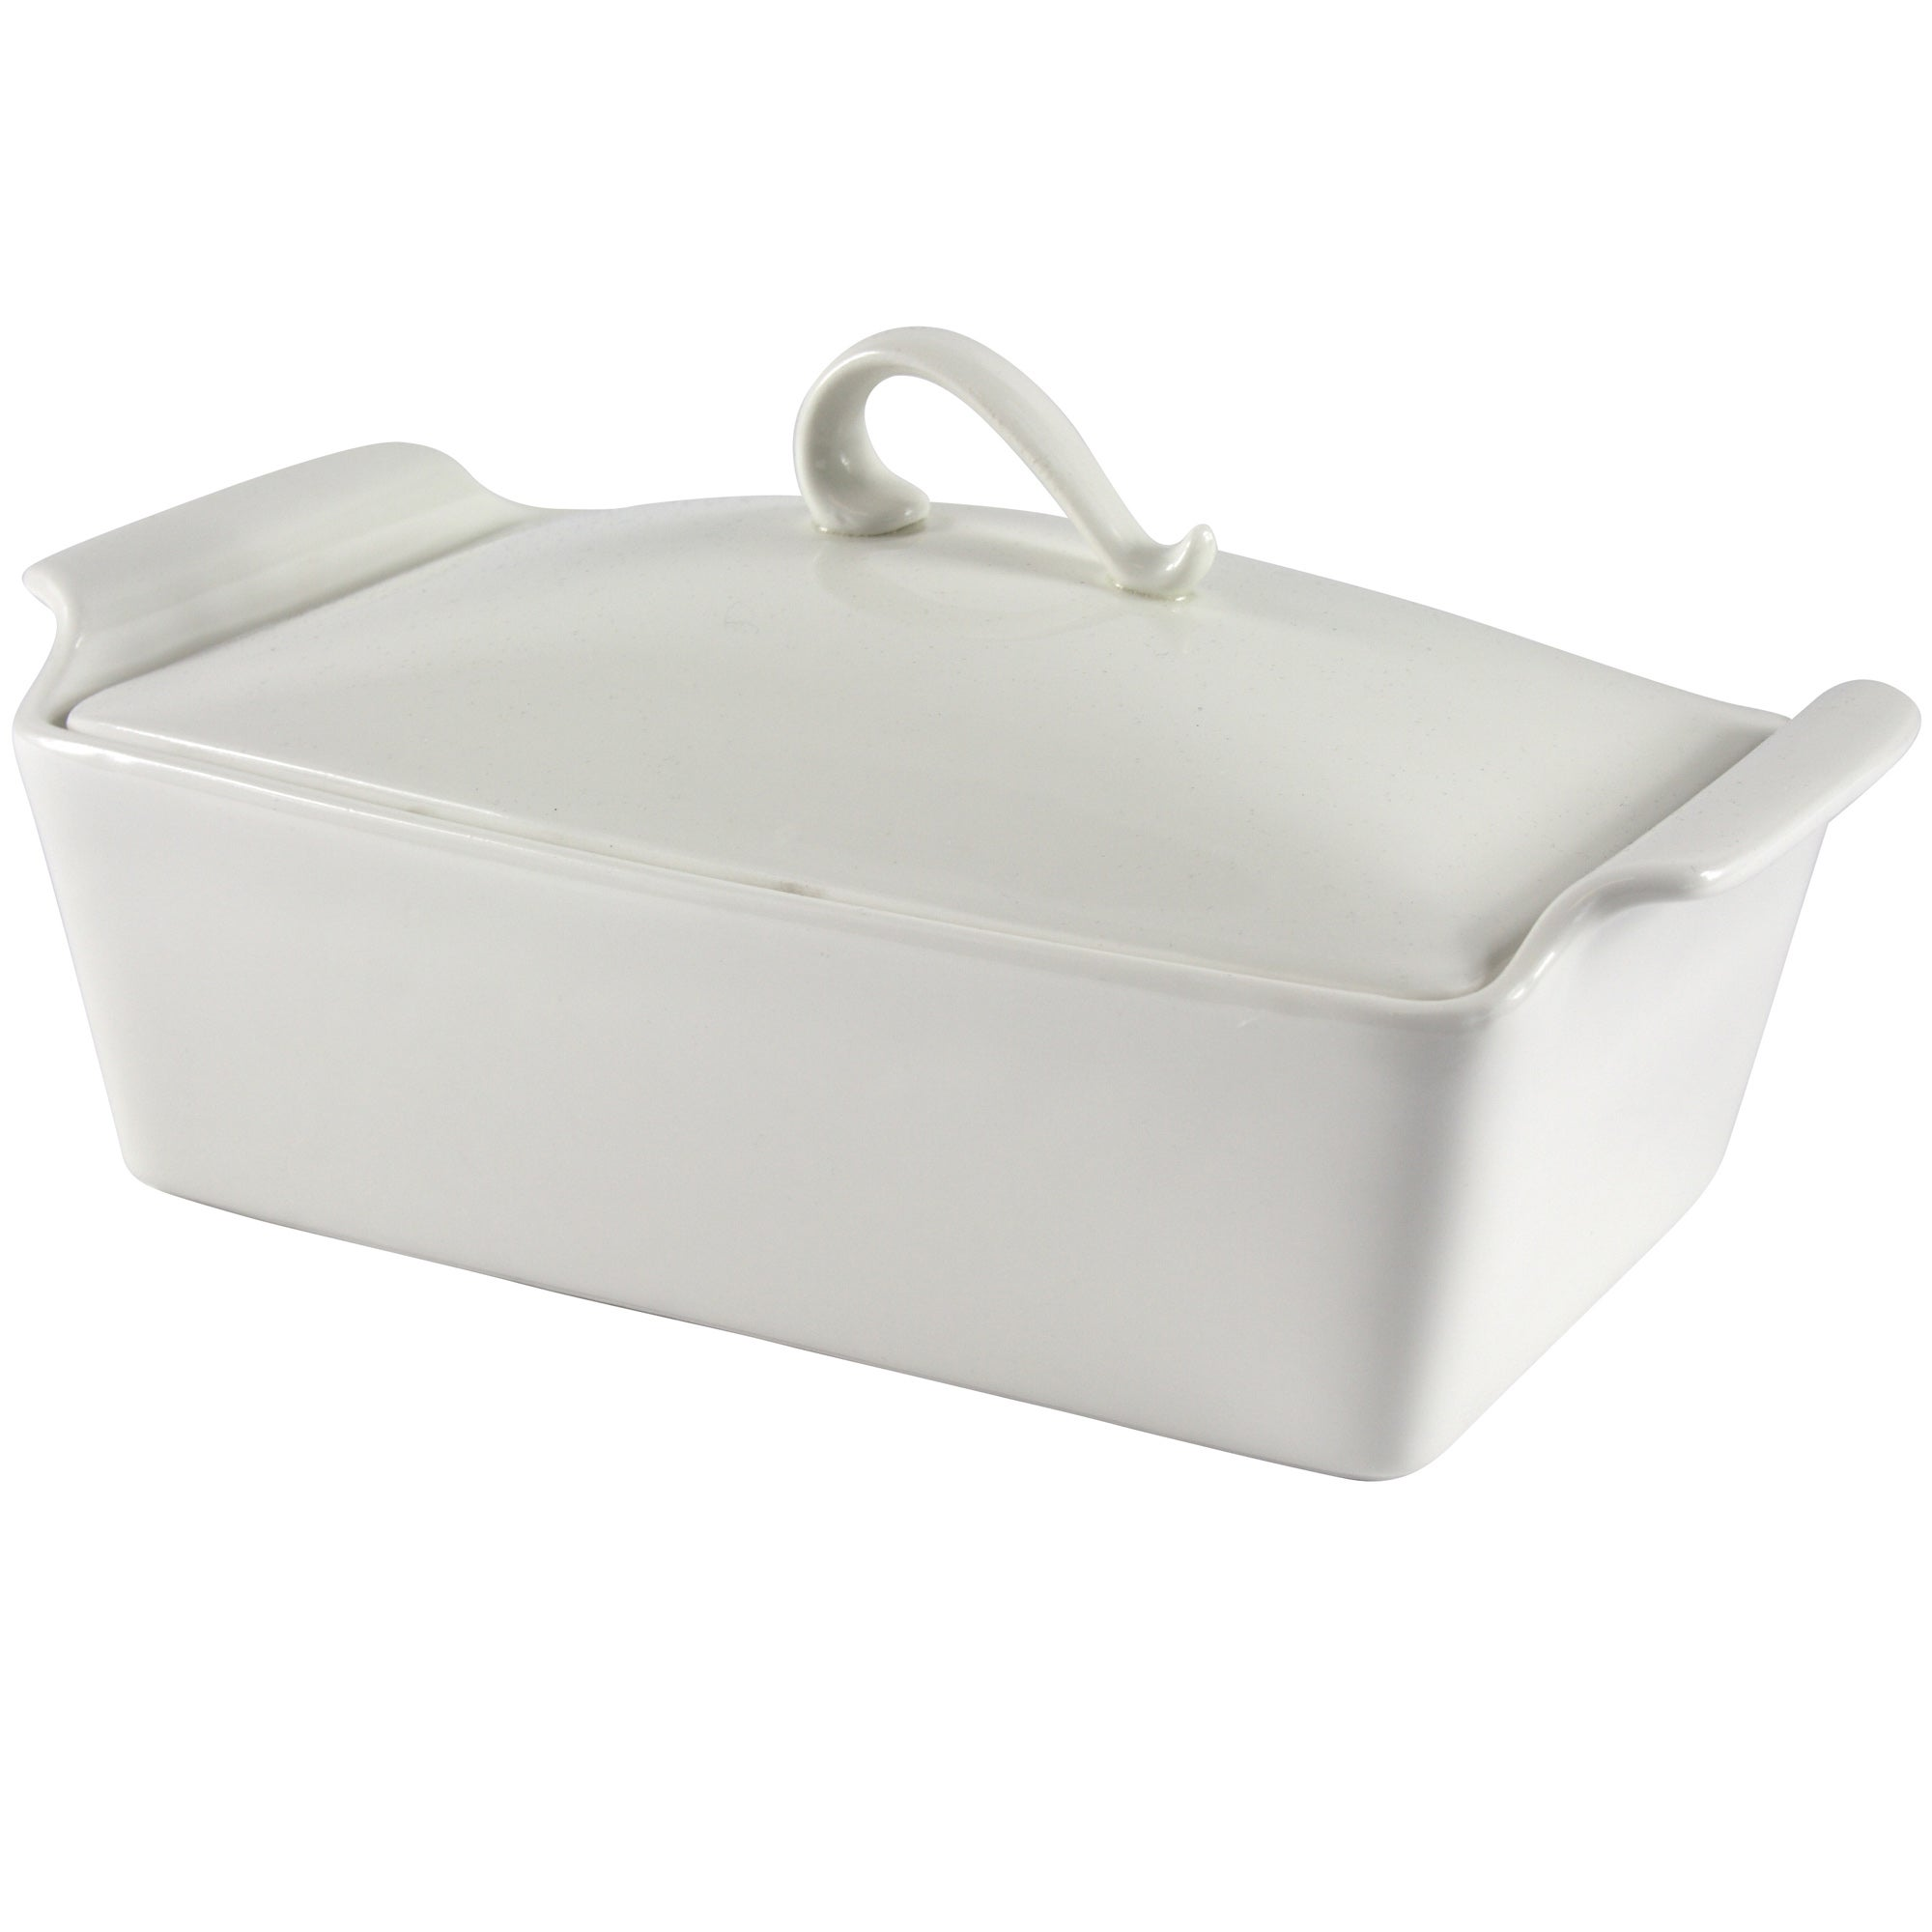 Image of Pausa Lidded Casserole Dish White